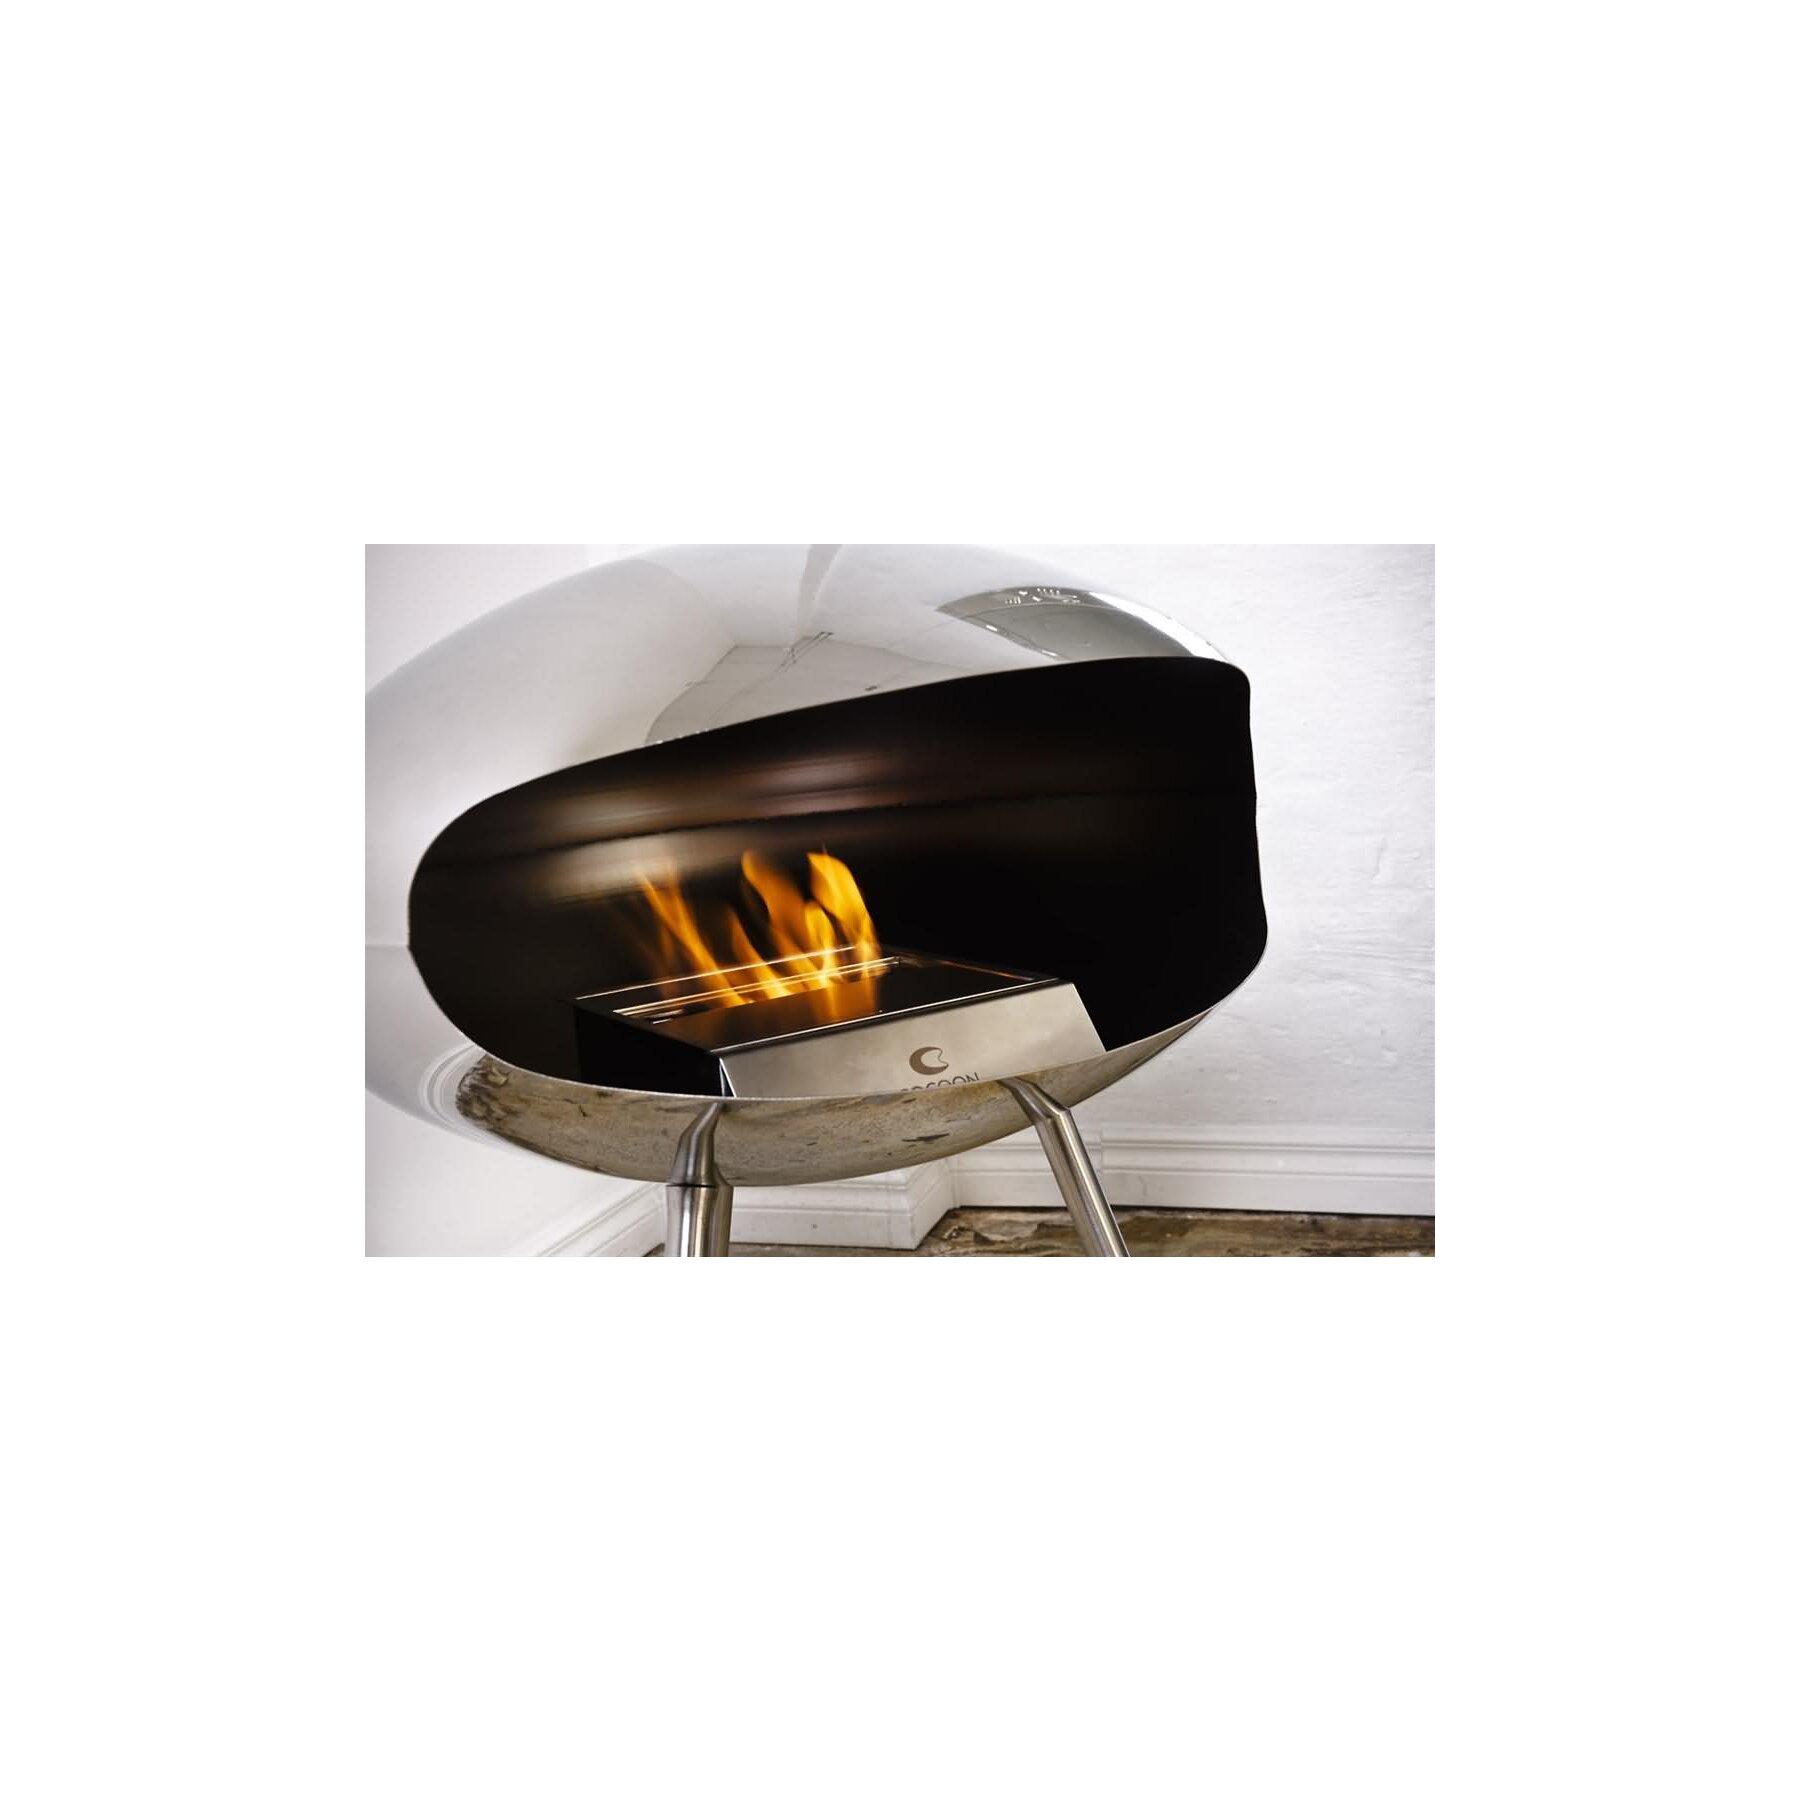 Cocoon fire terra design ethanolkamin stehend for Ethanol kamin design